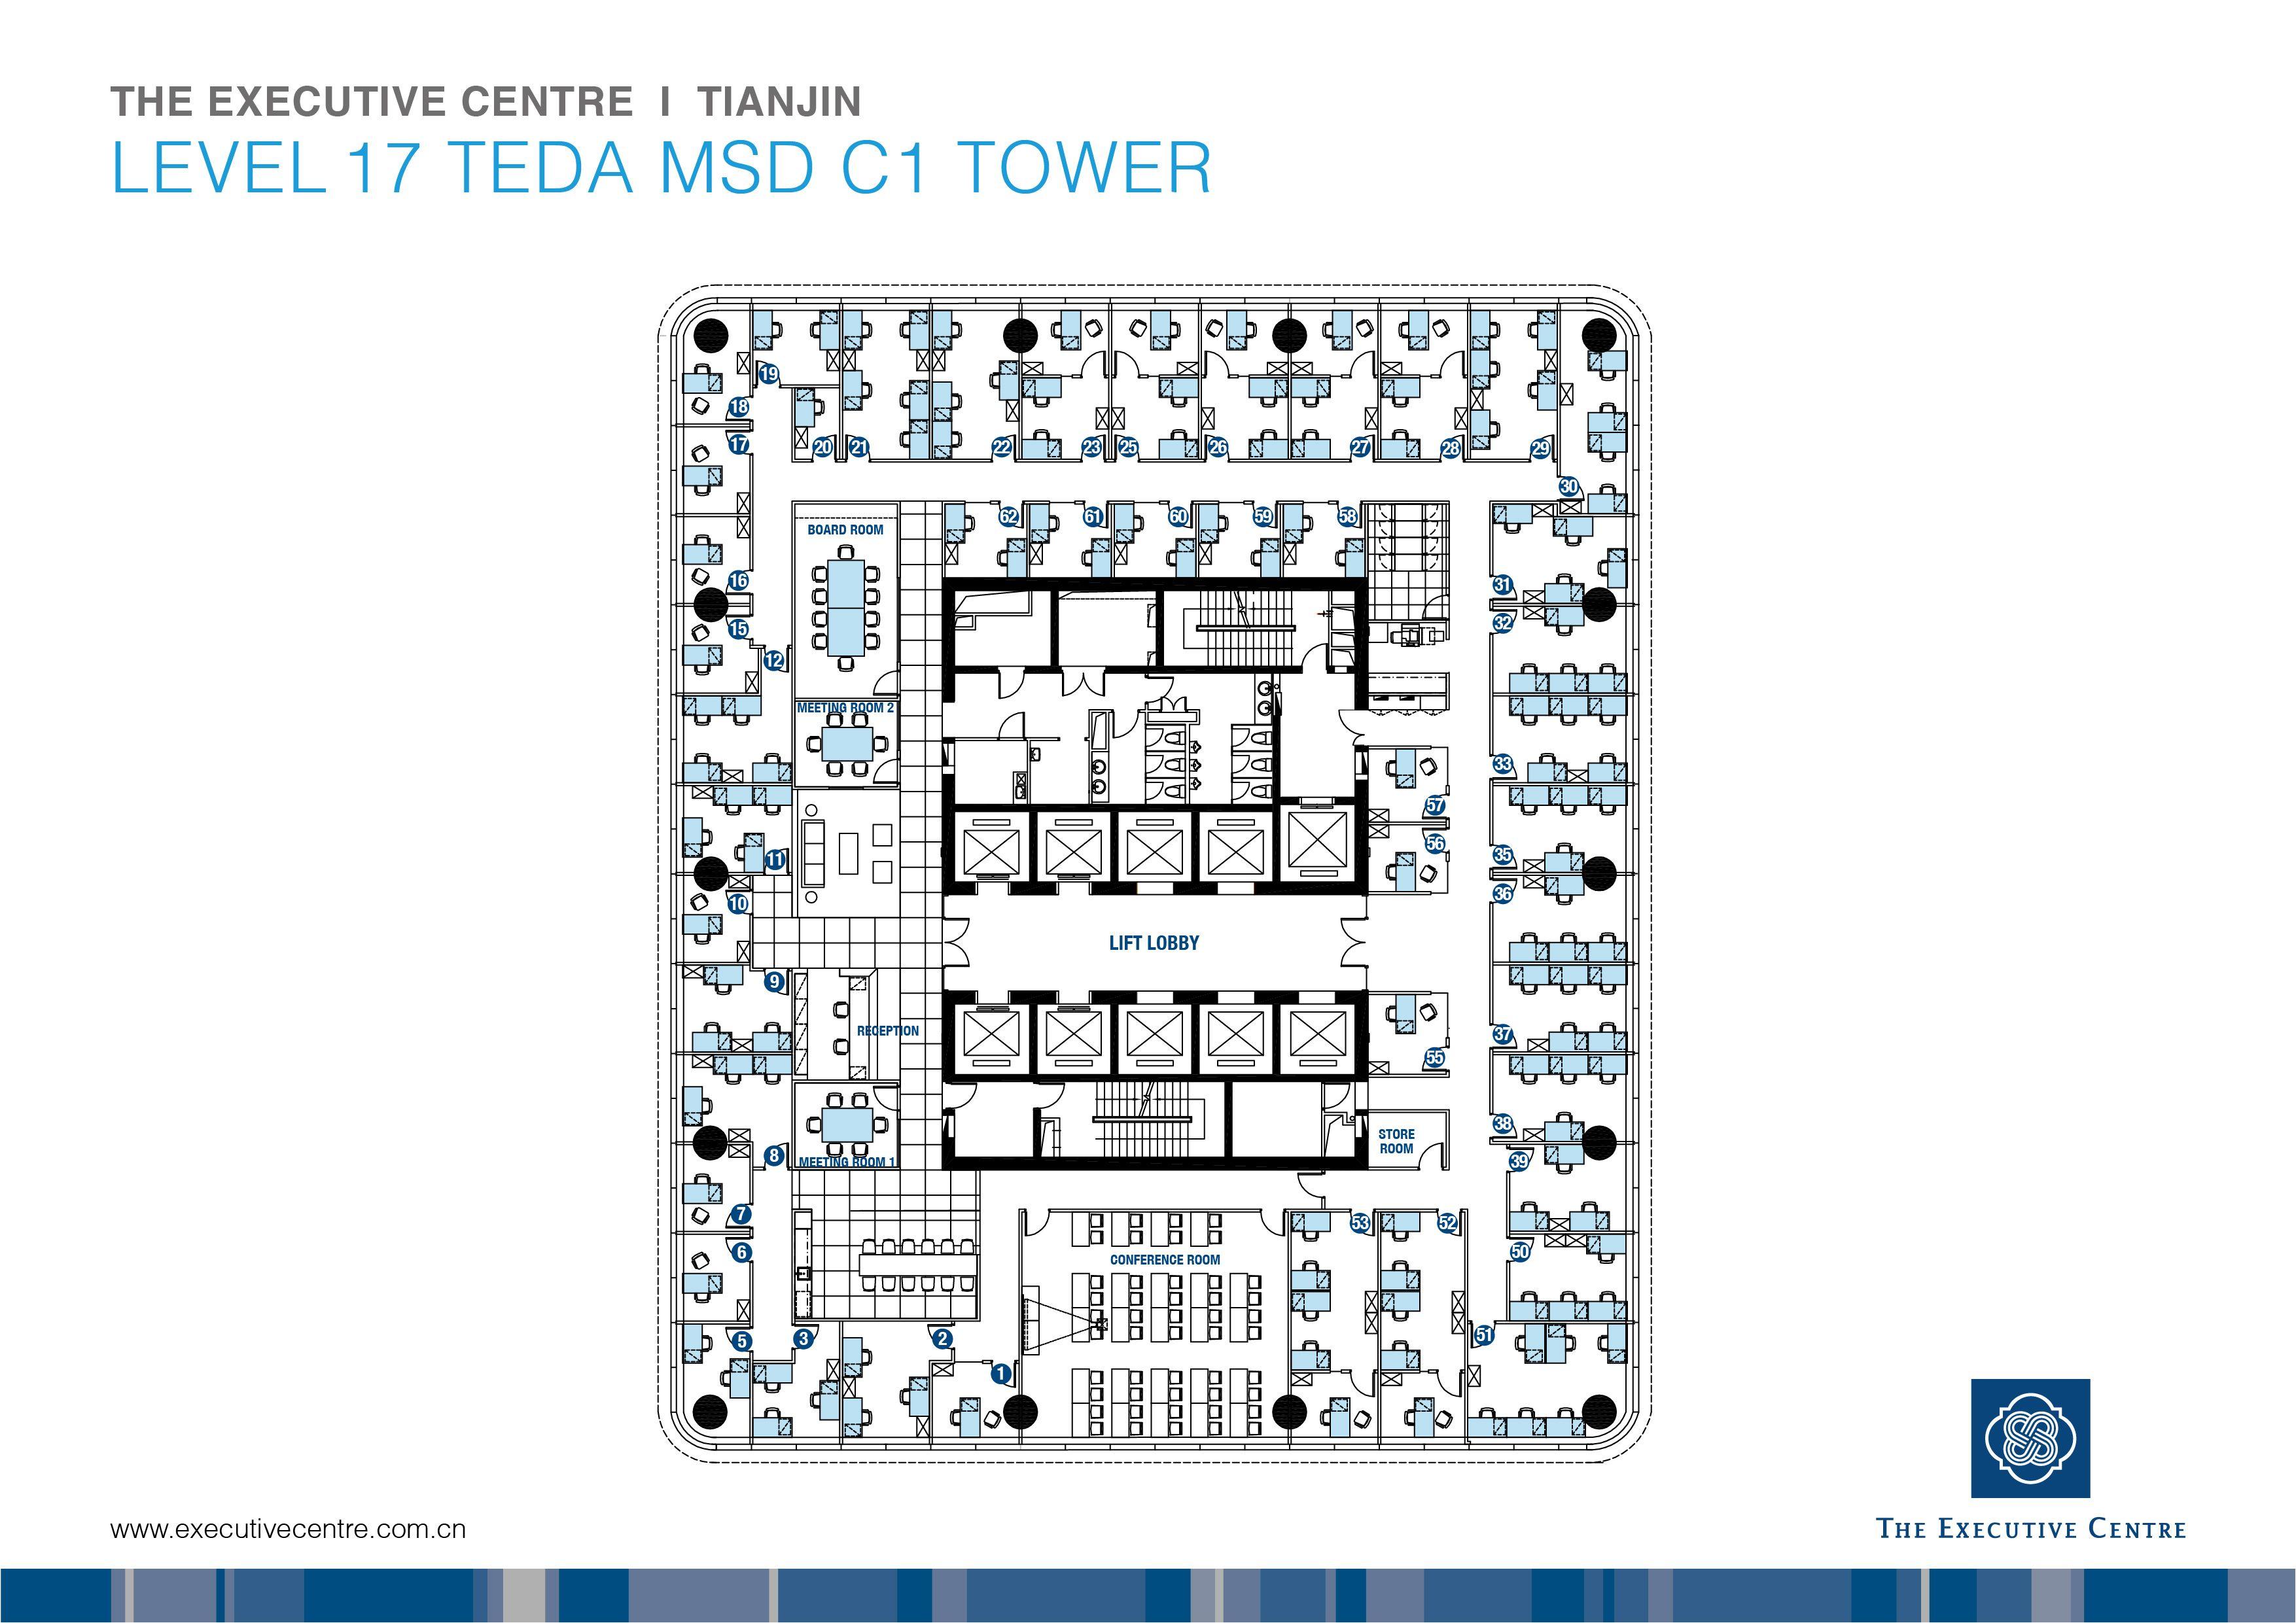 Fp Tianjin Teda Msd C1 Tower Jpg 3509 2481 Bedroom Floor Plans Floor Plans Office Floor Plan